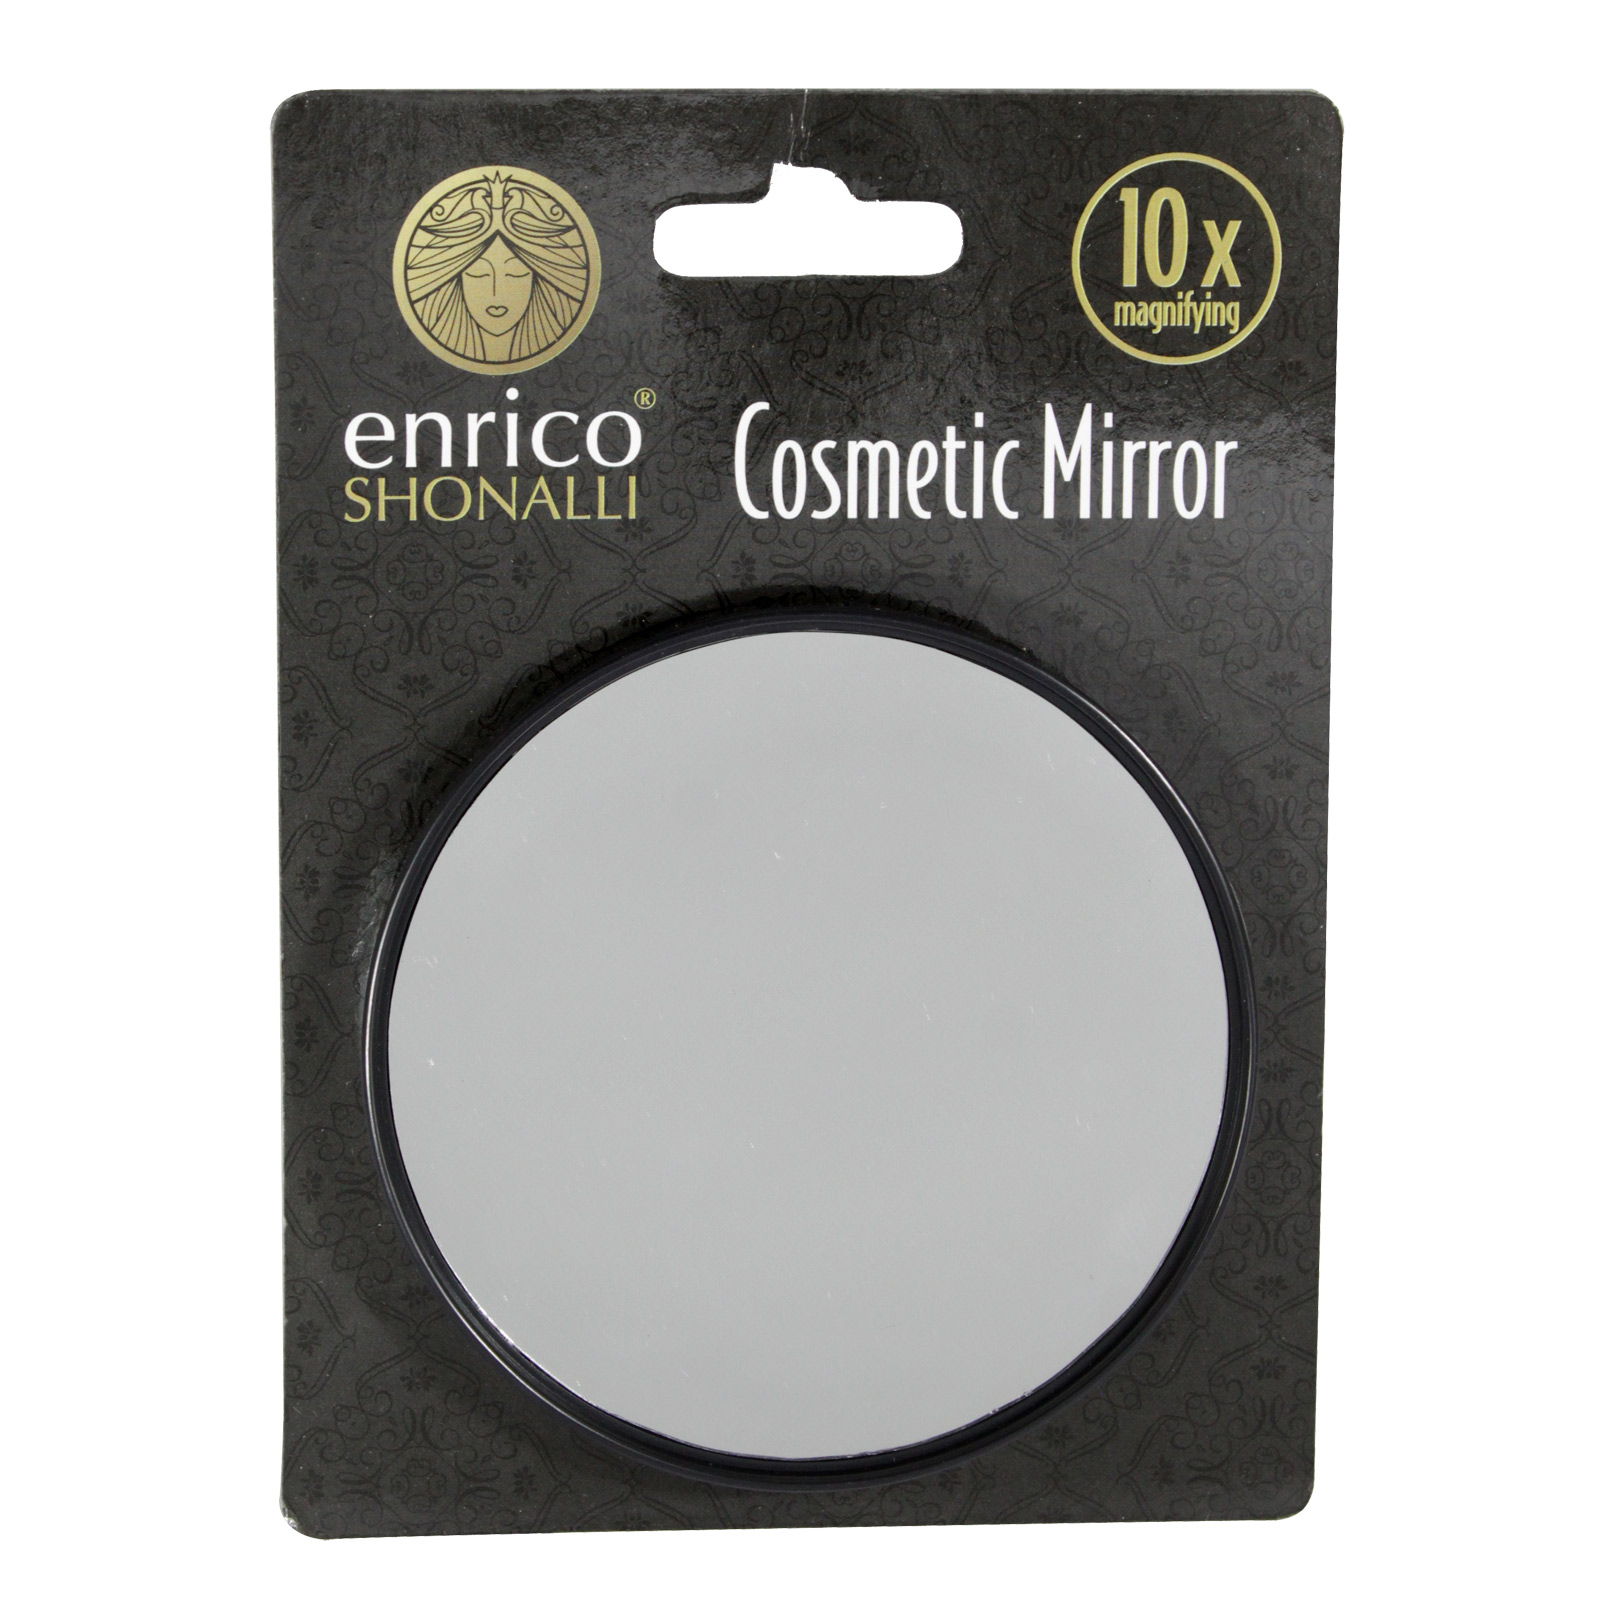 ENRICO COSMETIC MIRROR 10X MAGNIFYING